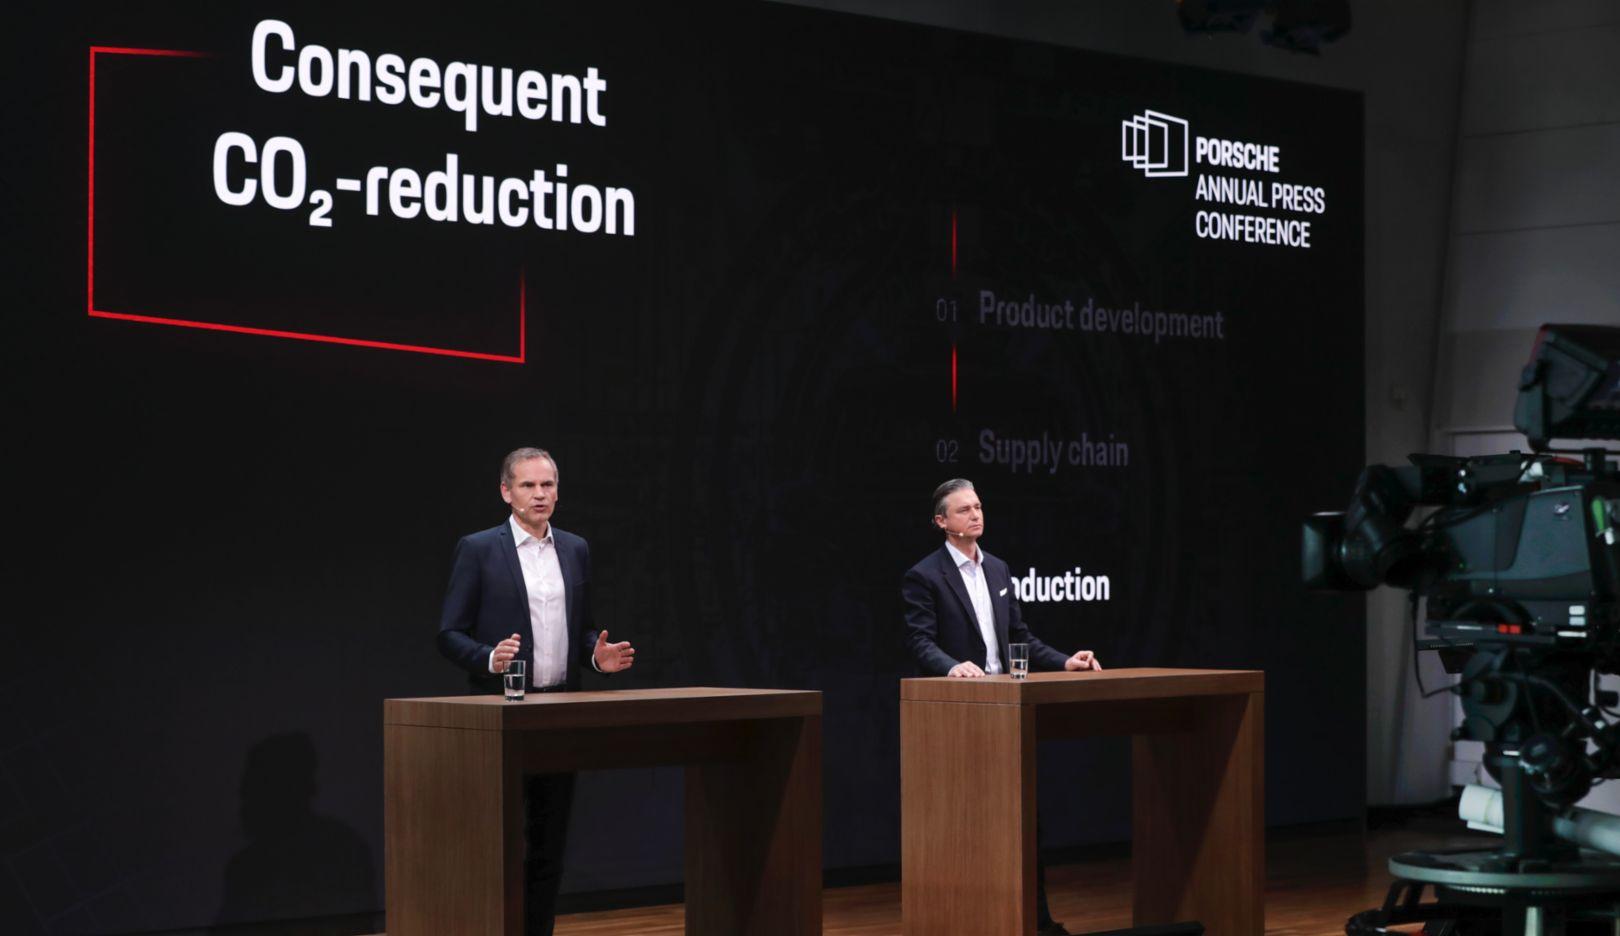 Porsche aims for CO2-neutral balance sheet in 2030 - Image 1